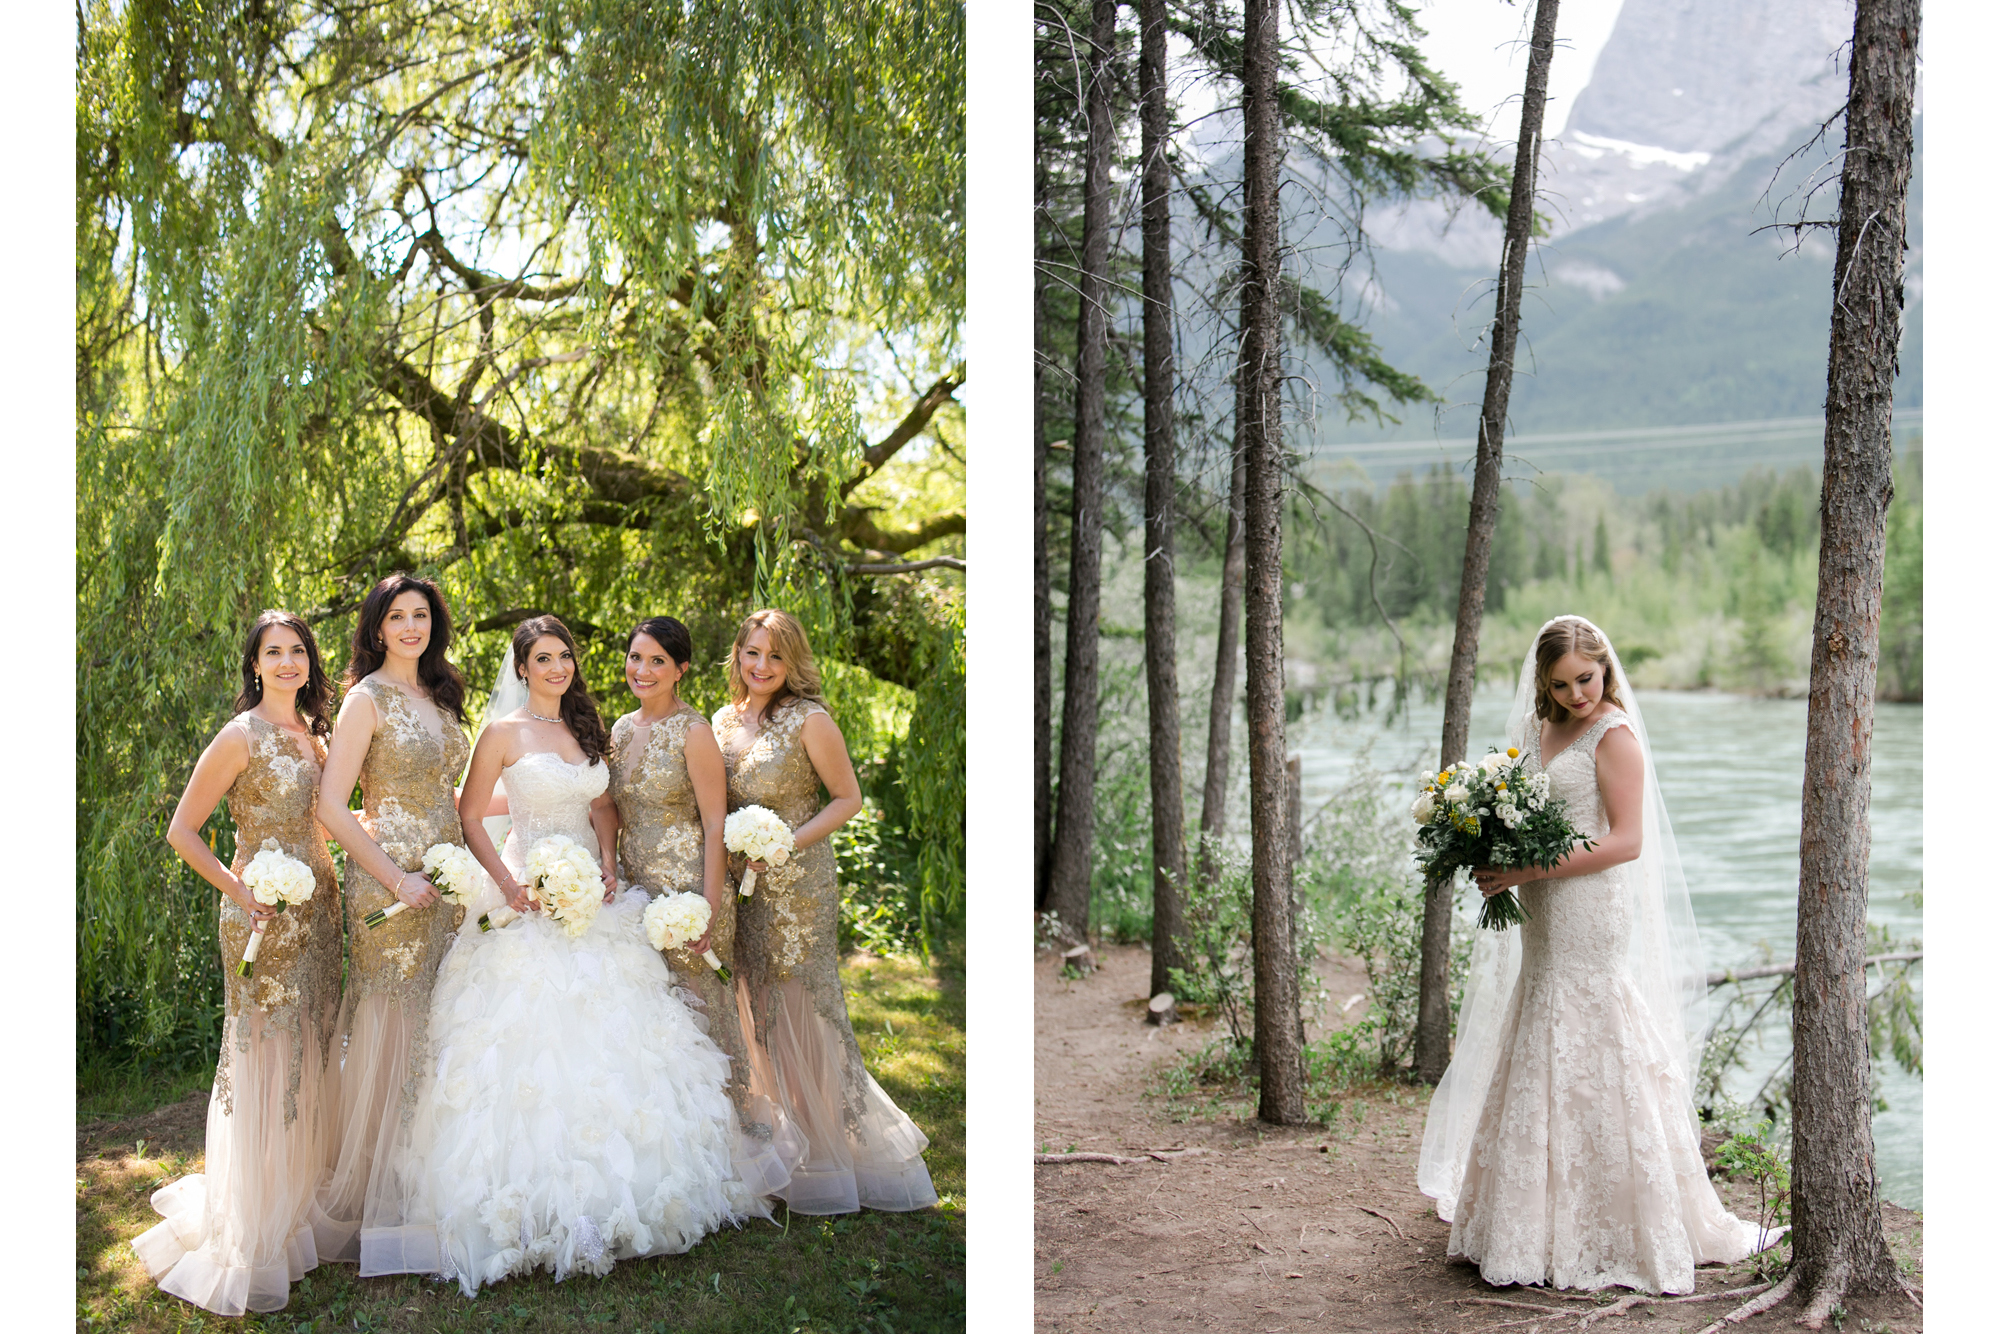 vancouver-luxury-wedding-photographer-lori-miles-27.jpg